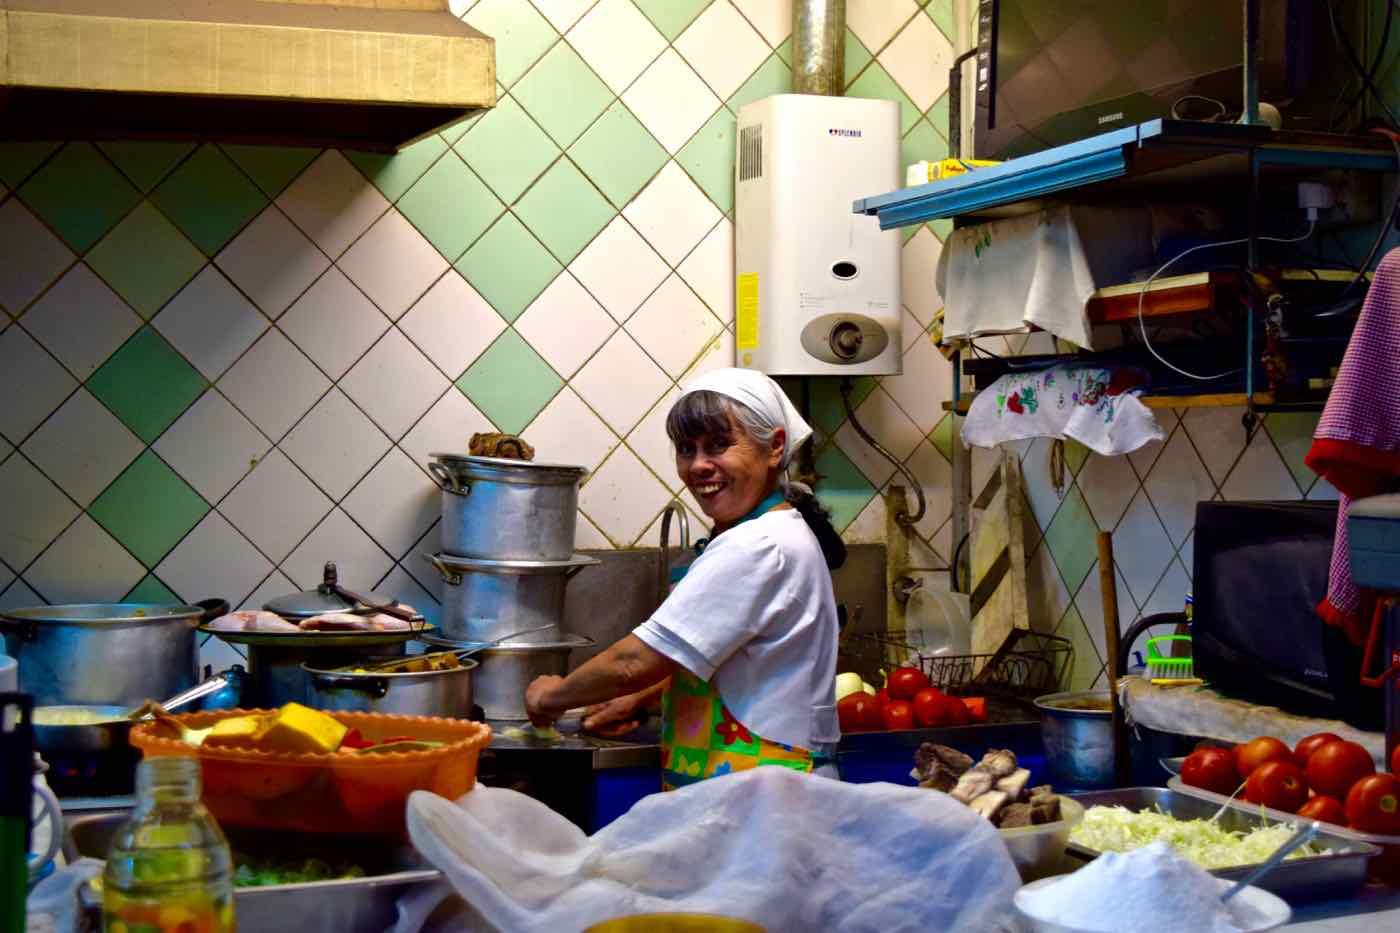 Chefs working in Santiago's Central Markets